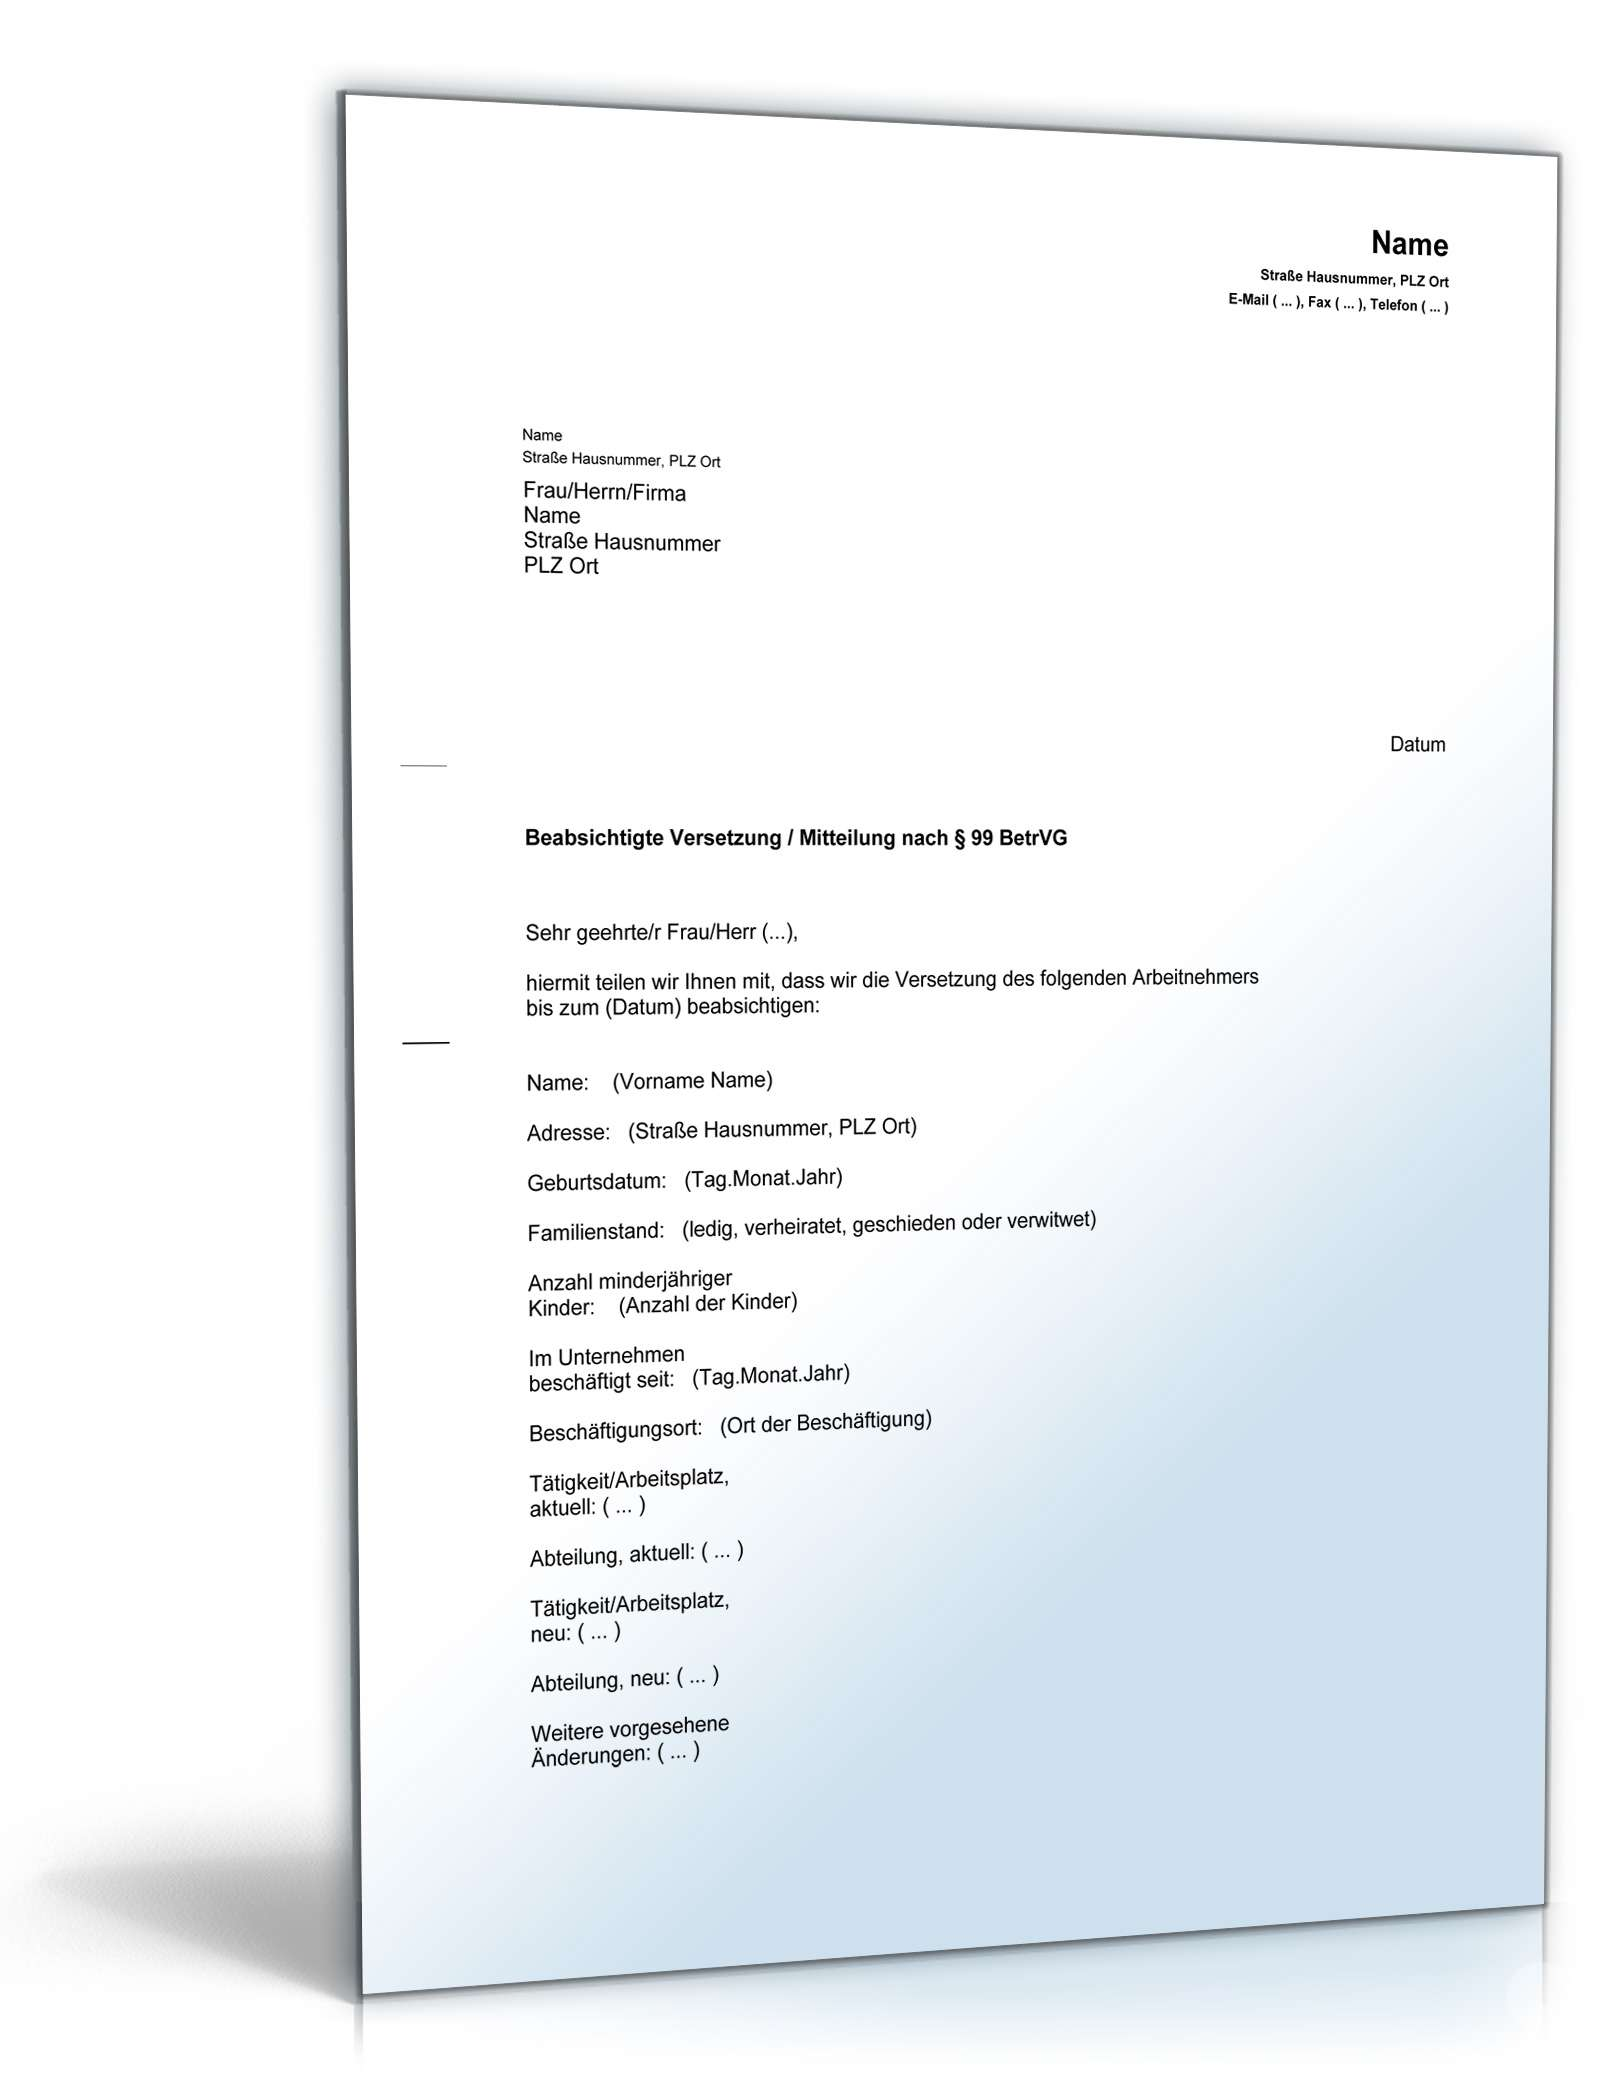 Versetzung An Anderen Arbeitsort Arbeitsrecht 2021